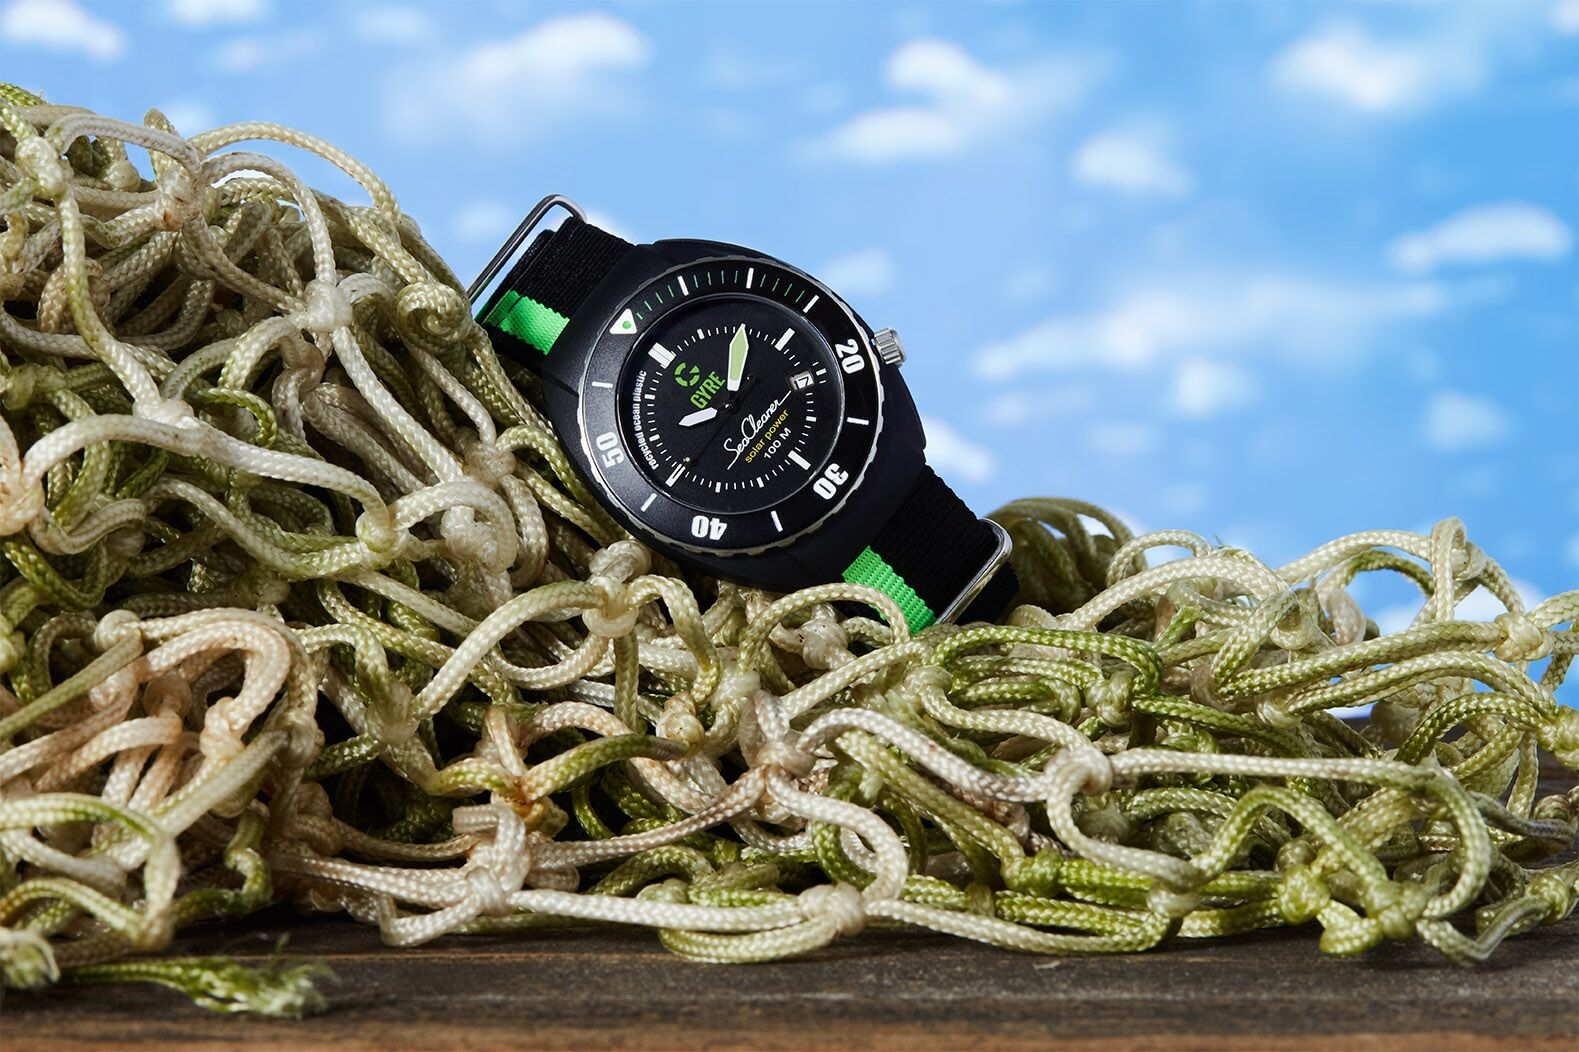 De GYRE SeaCleaner is gemaakt van gerecyclede visnetten